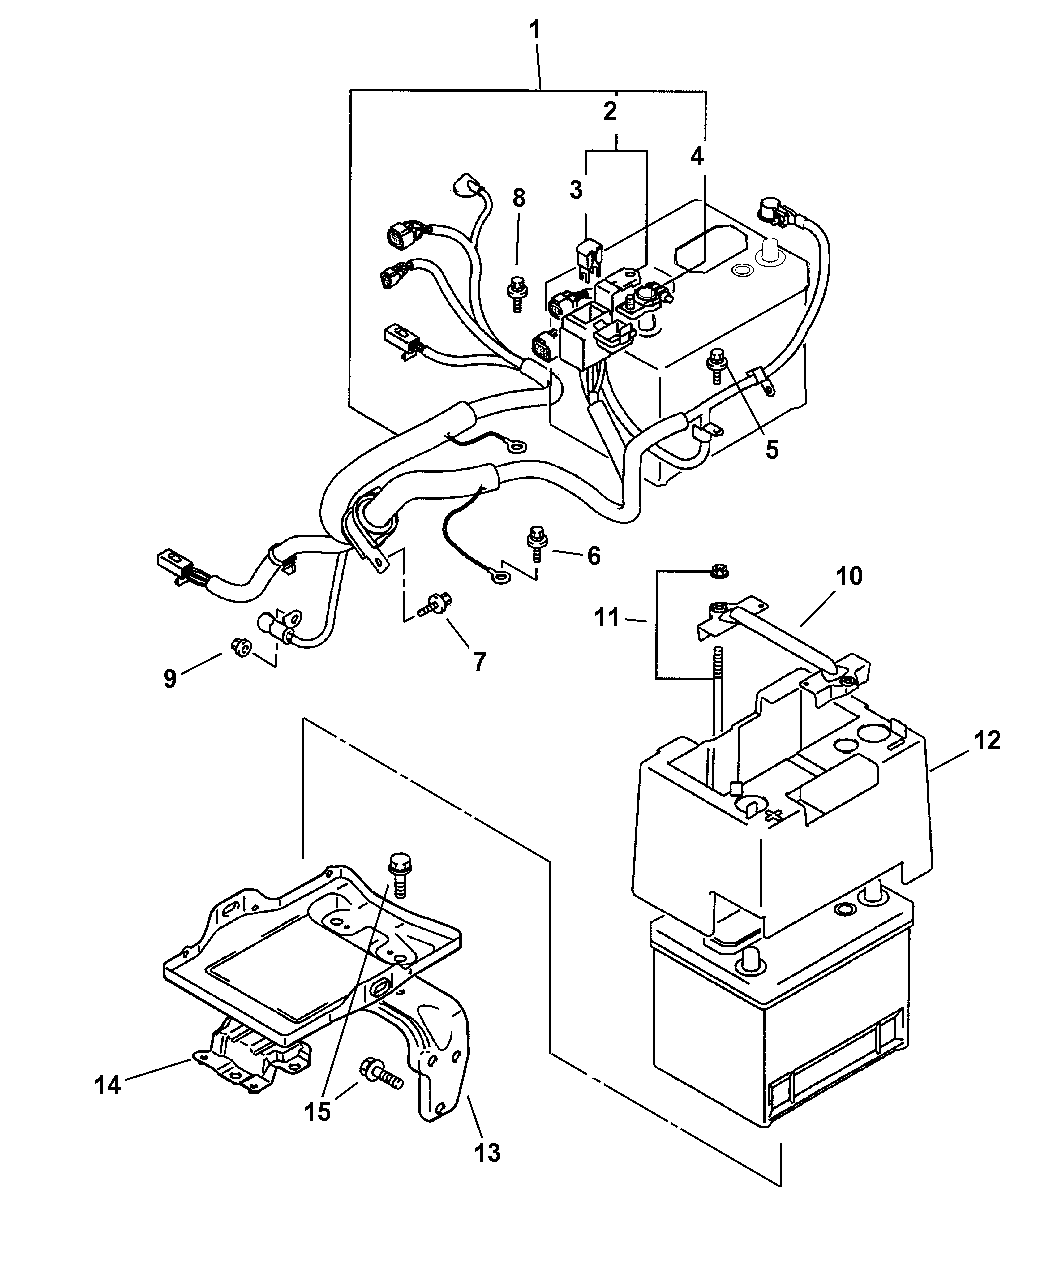 wiring a bat diagram wiring a light diagram #4